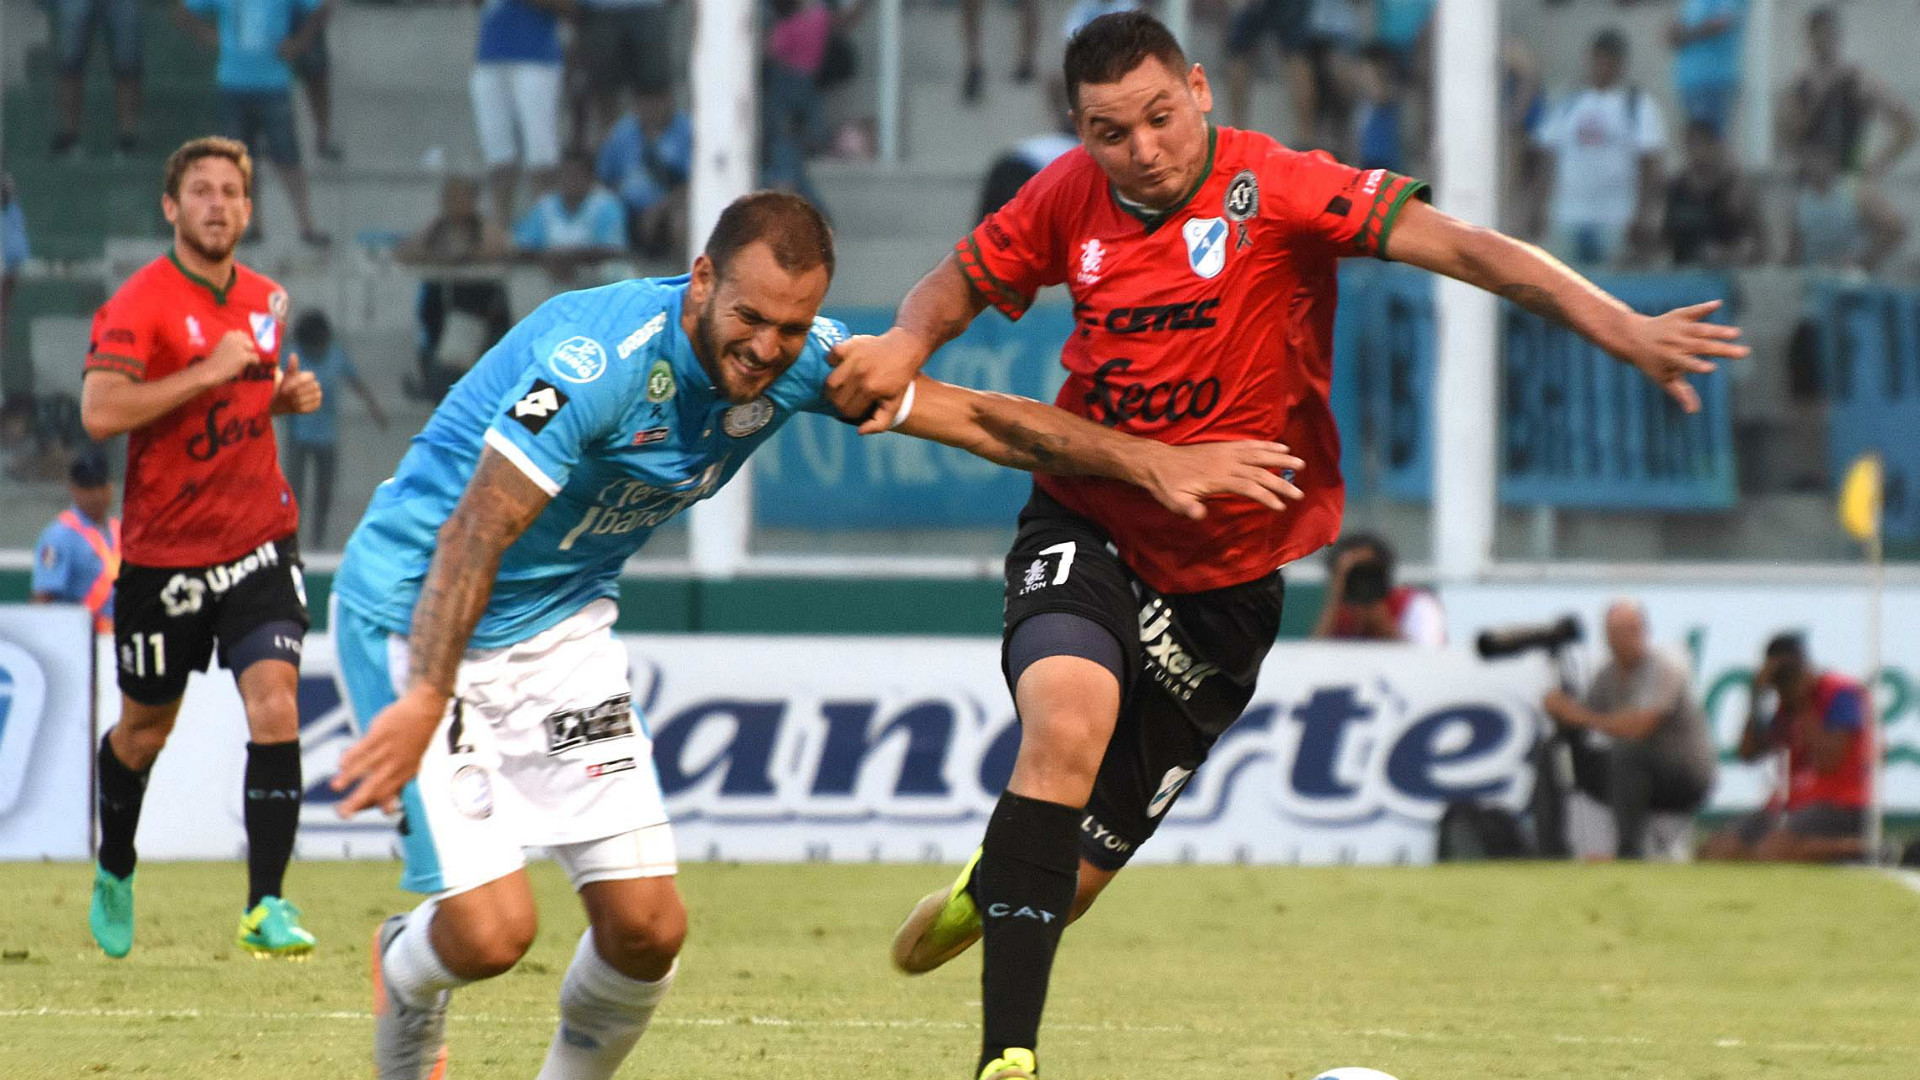 Aveldaño Gonzalo Rios Belgrano Temperley Primera Division 04122016